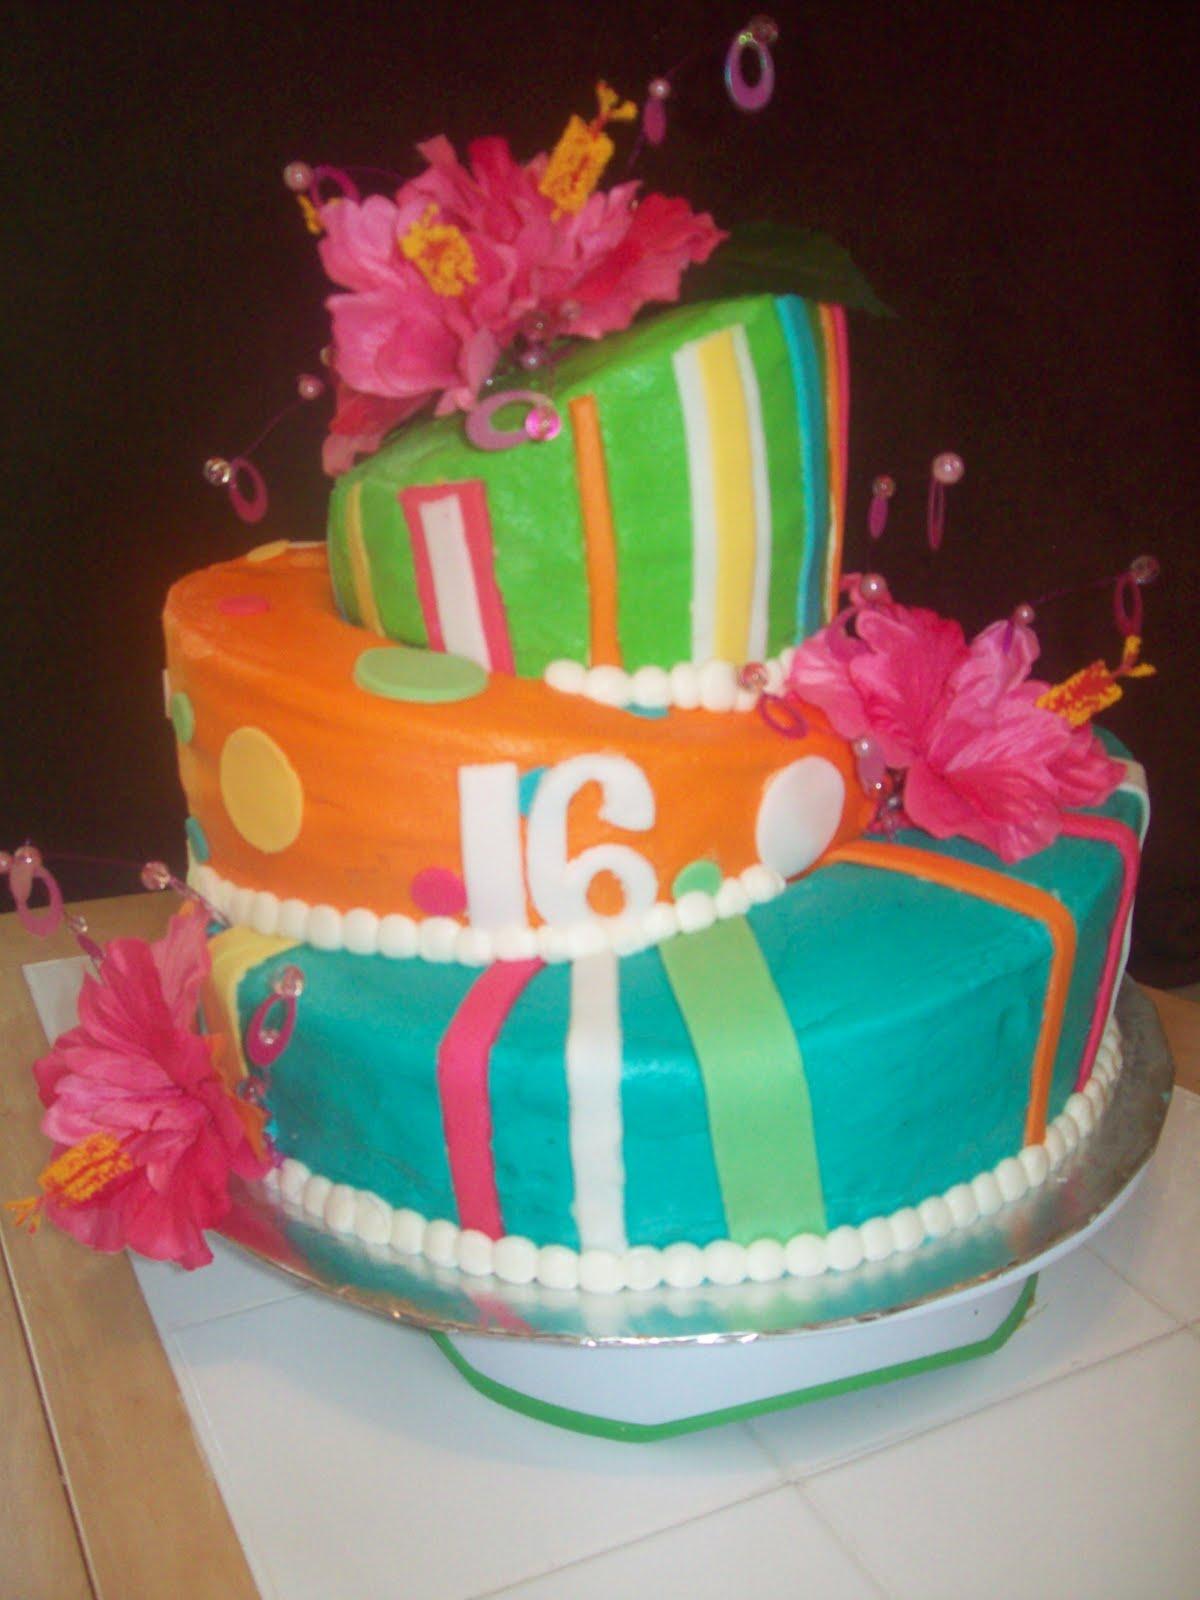 Cake Designs For 16th Birthday Girl : BB Cakes: Topsy-turvy 16th birthday cake